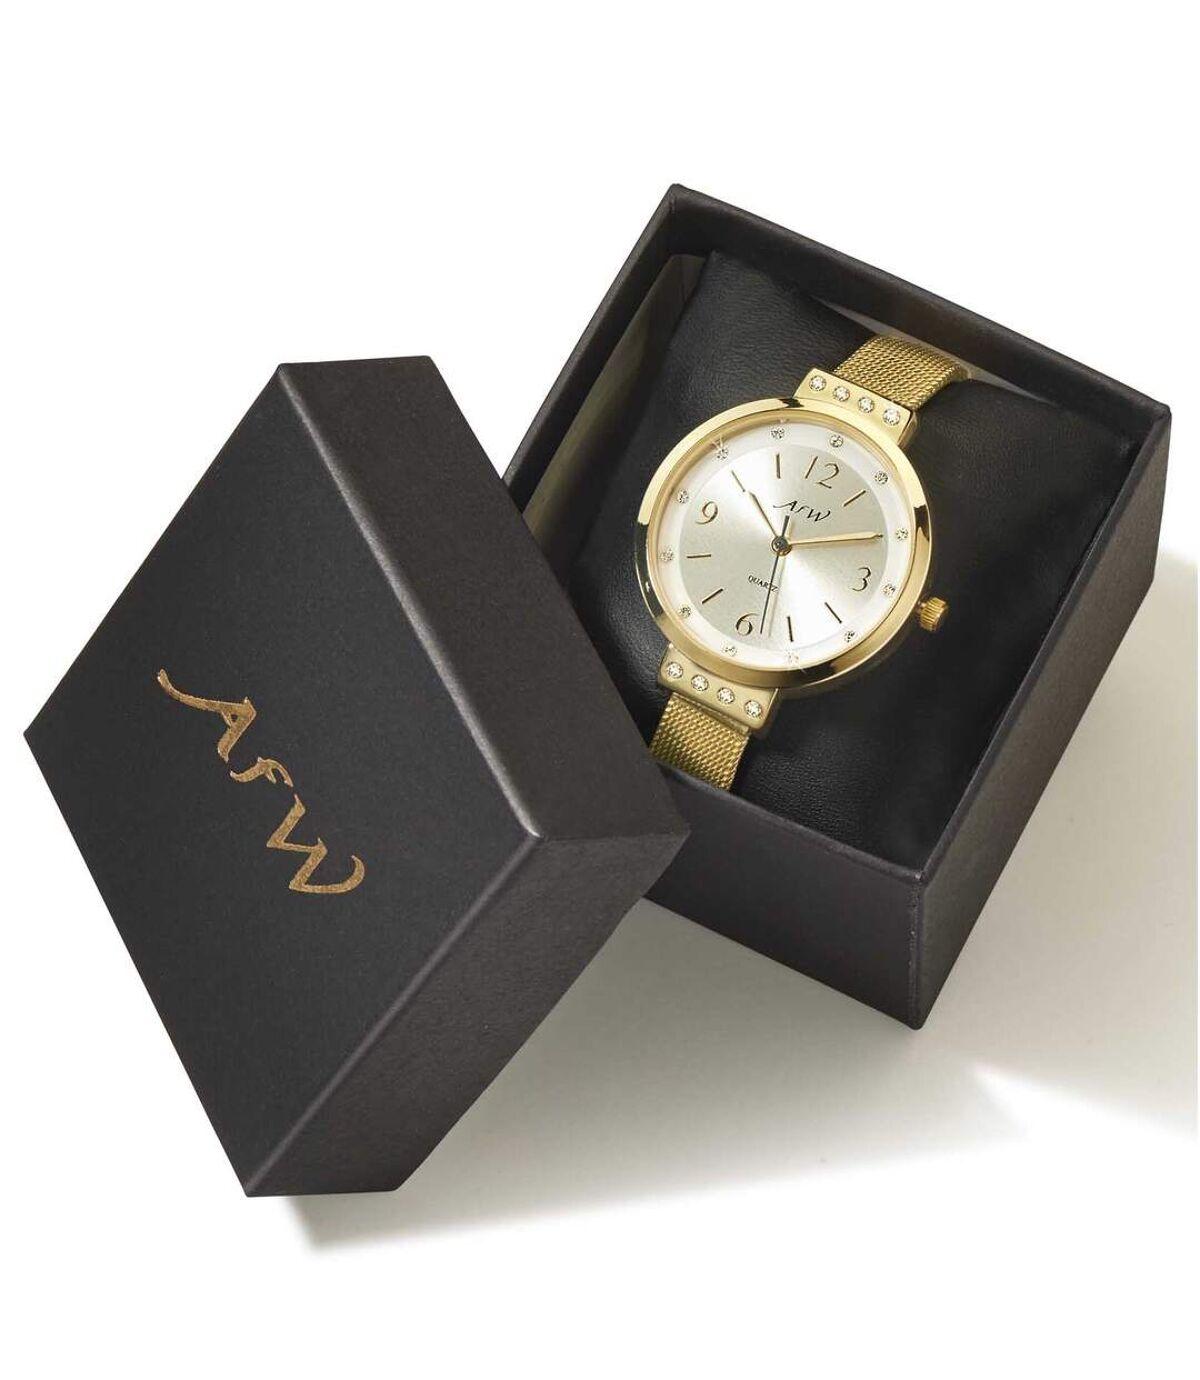 Elegantní hodinky Šperk Atlas For Men